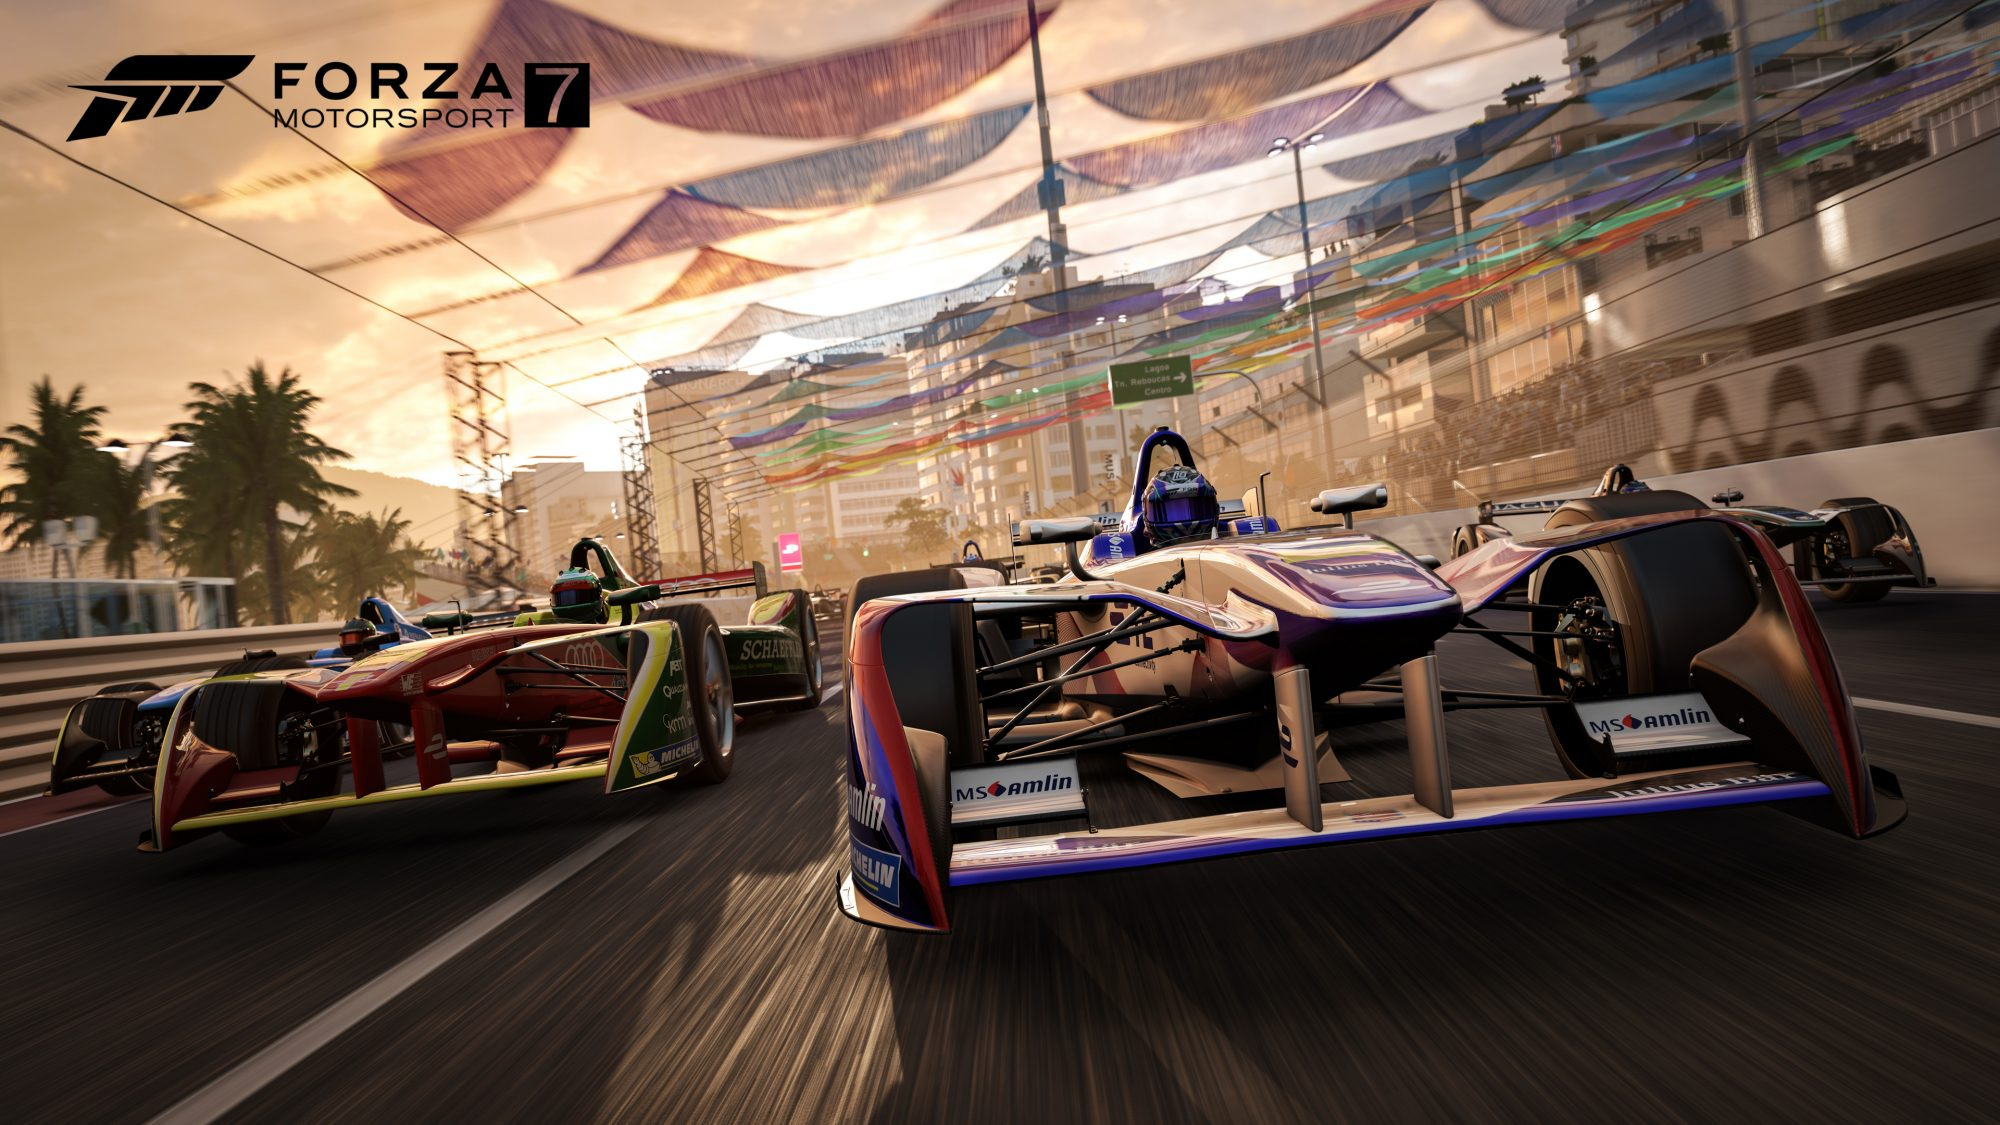 Forza Motorsport 7 Xbox One X PC Review Test 2